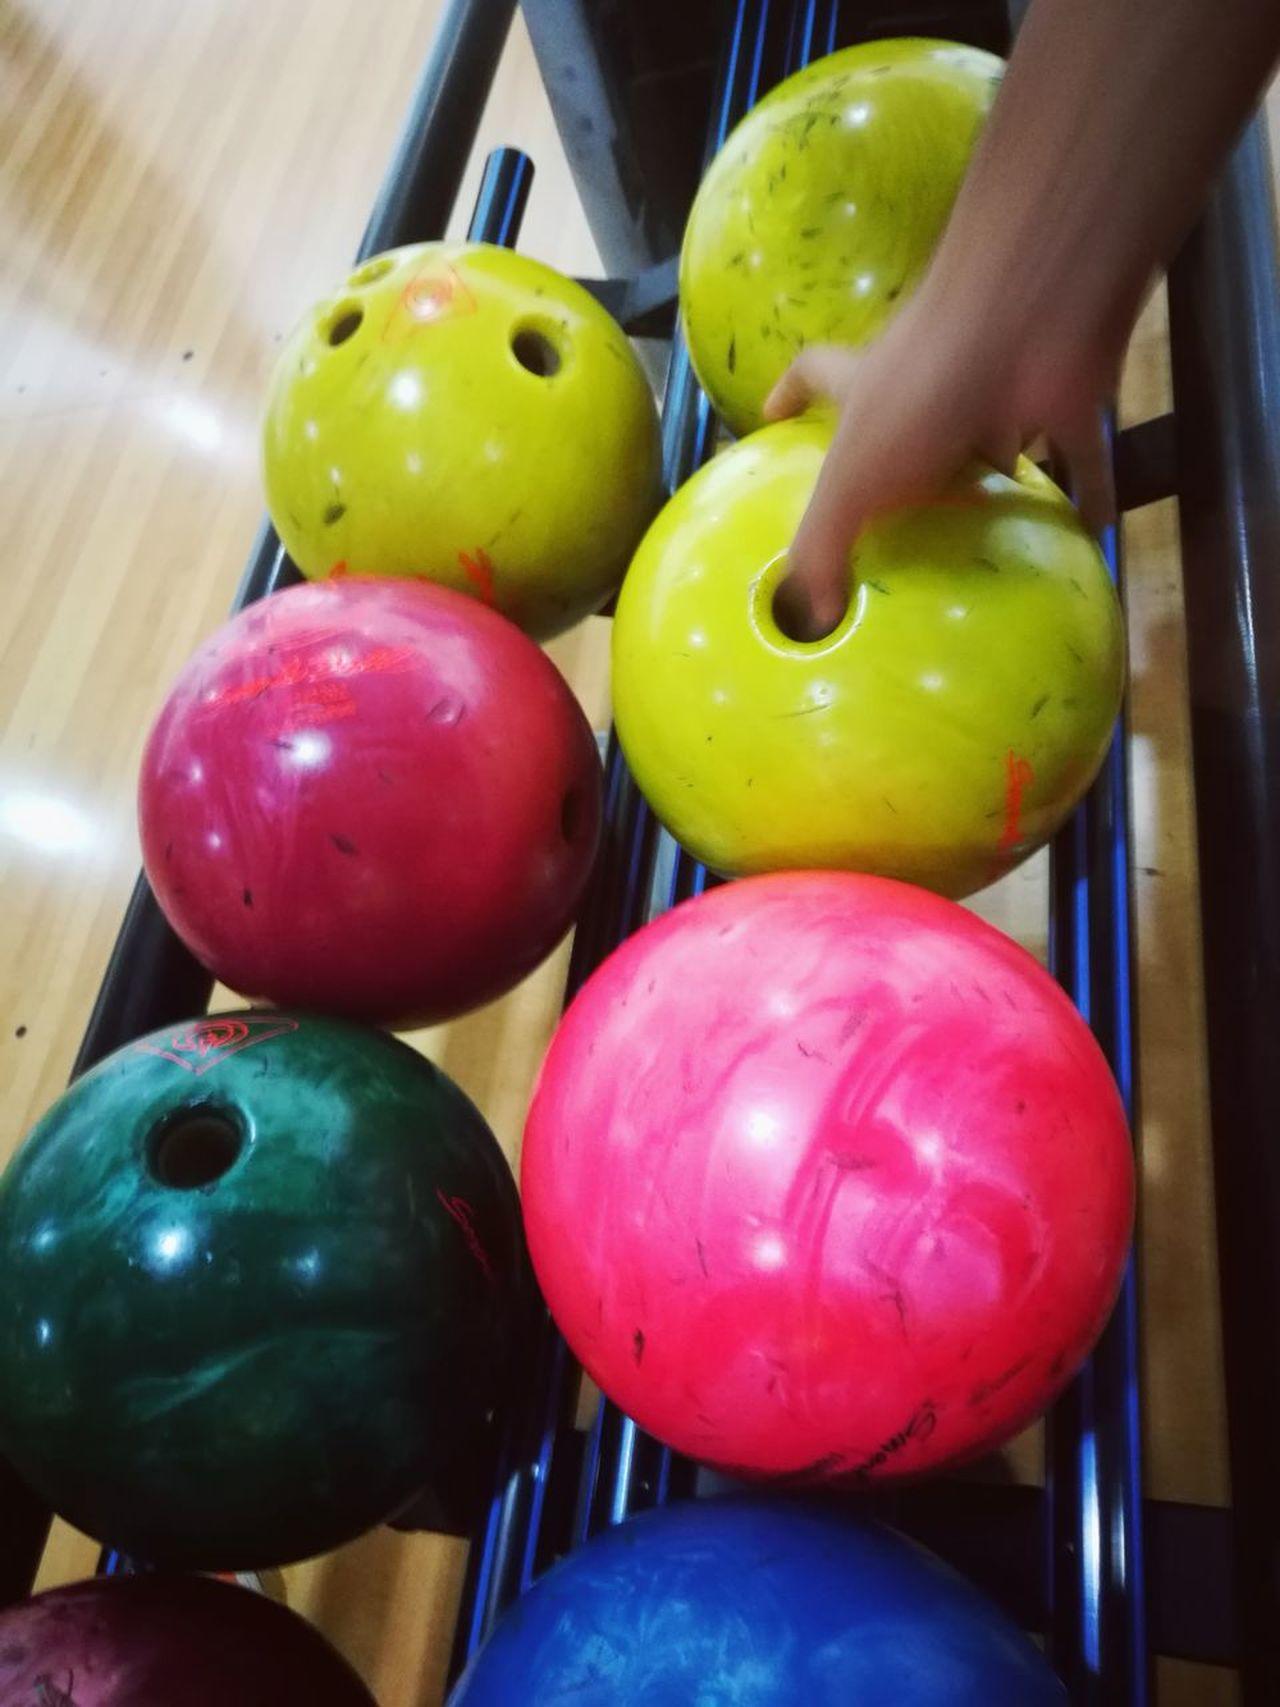 Bowling Hand Colours Bowling Alley Social Gathering Social Club Socialising Socializing The Old Fashion Way Balls Bowling Balls Bowlingnight Human Body Part Lifestyles Multi Colored Human Hand Close-up Indoors